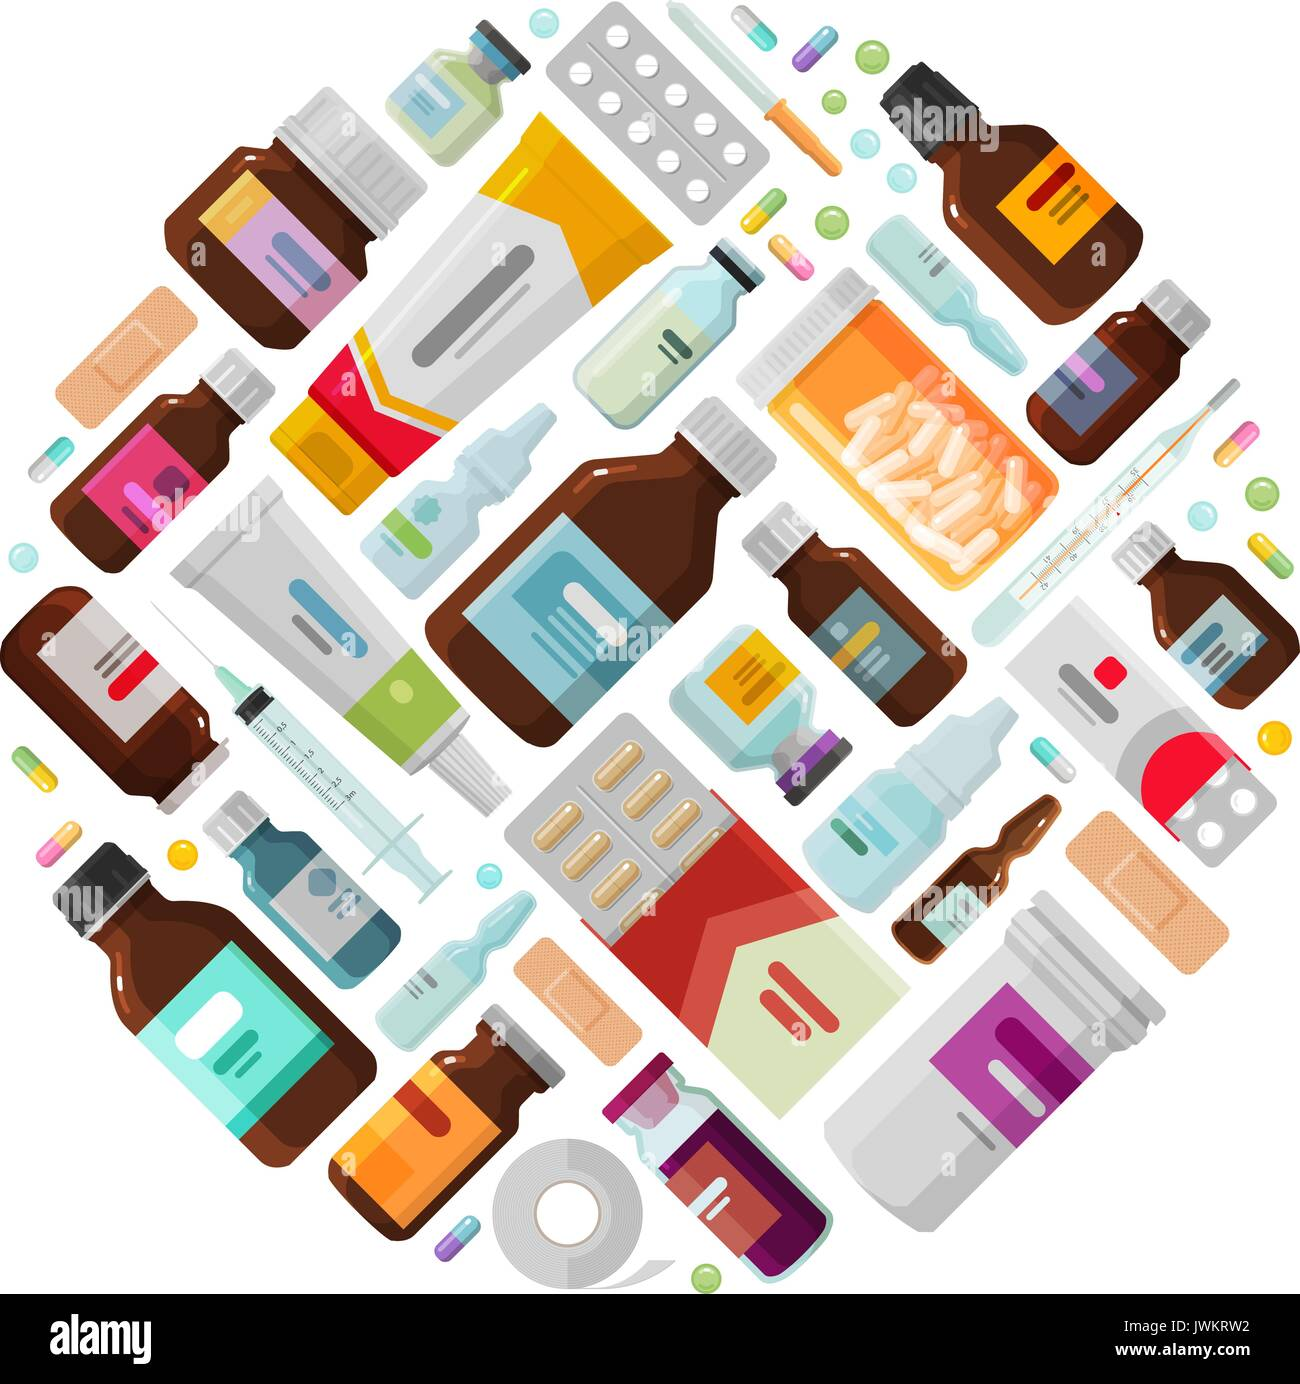 Medicine concept. Drug, medication, bottles and pills icons. Vector illustration - Stock Image